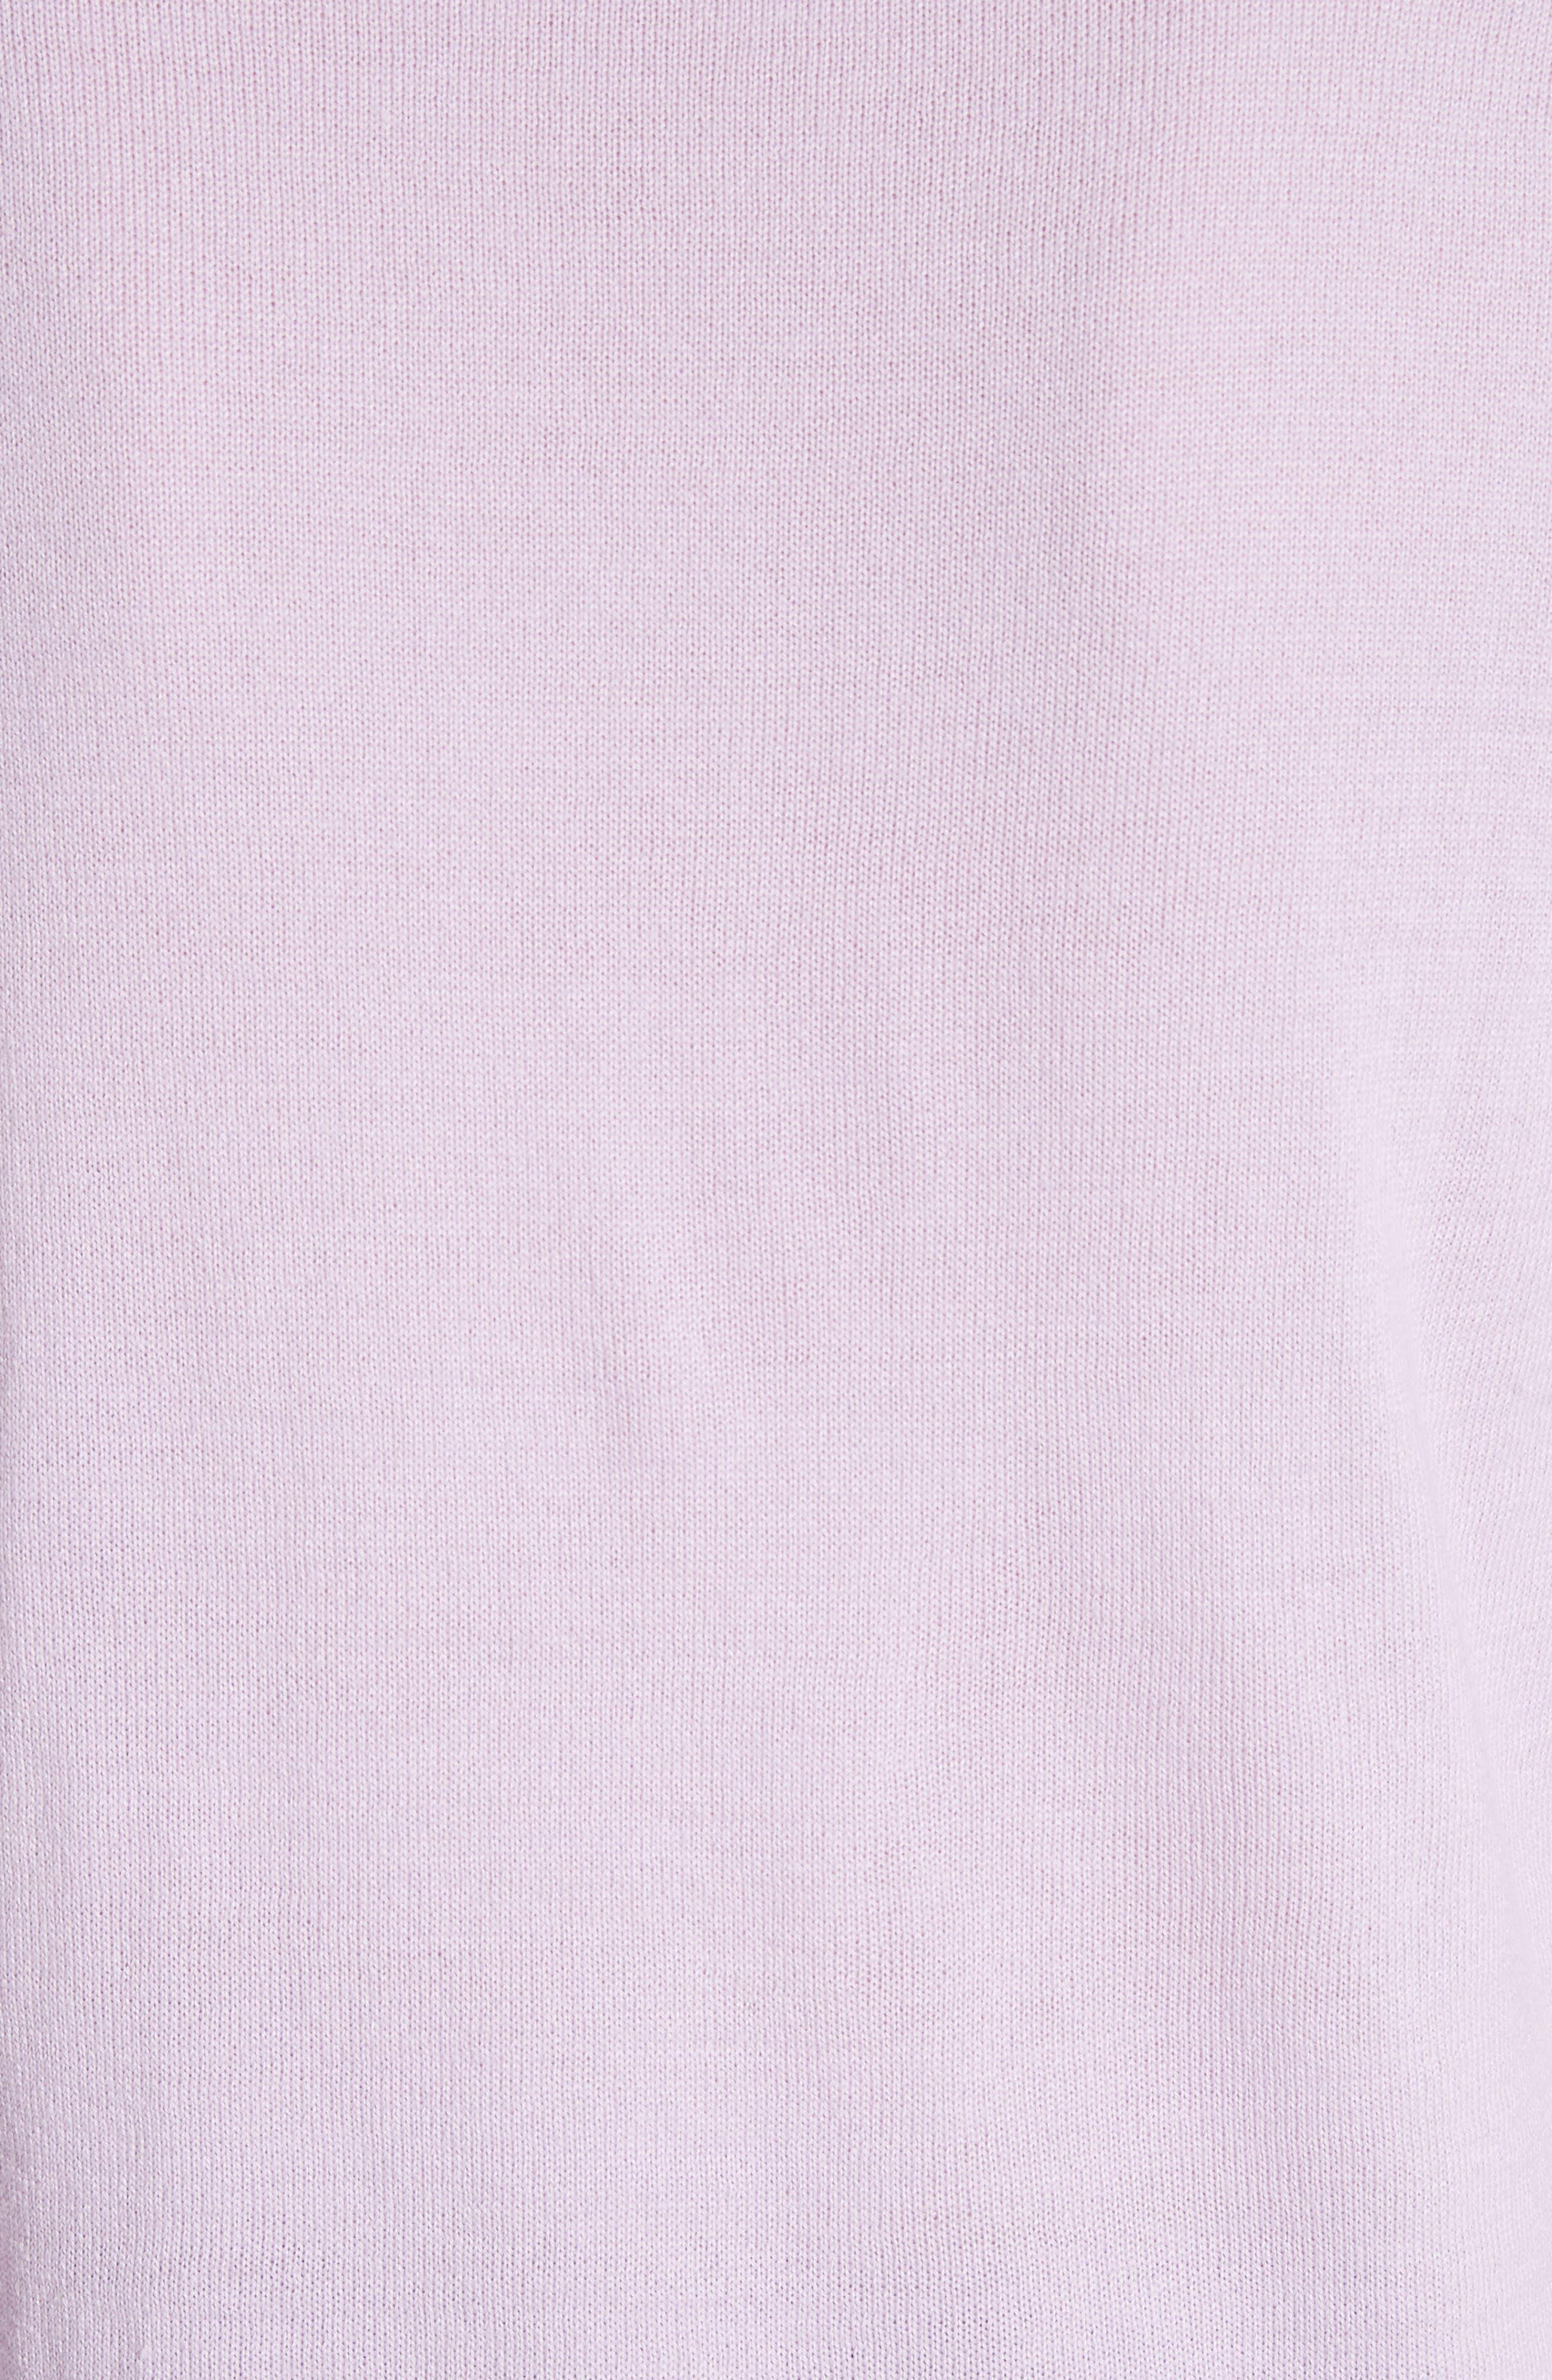 Sheer Panel Crewneck Sweater,                             Alternate thumbnail 6, color,                             Purple